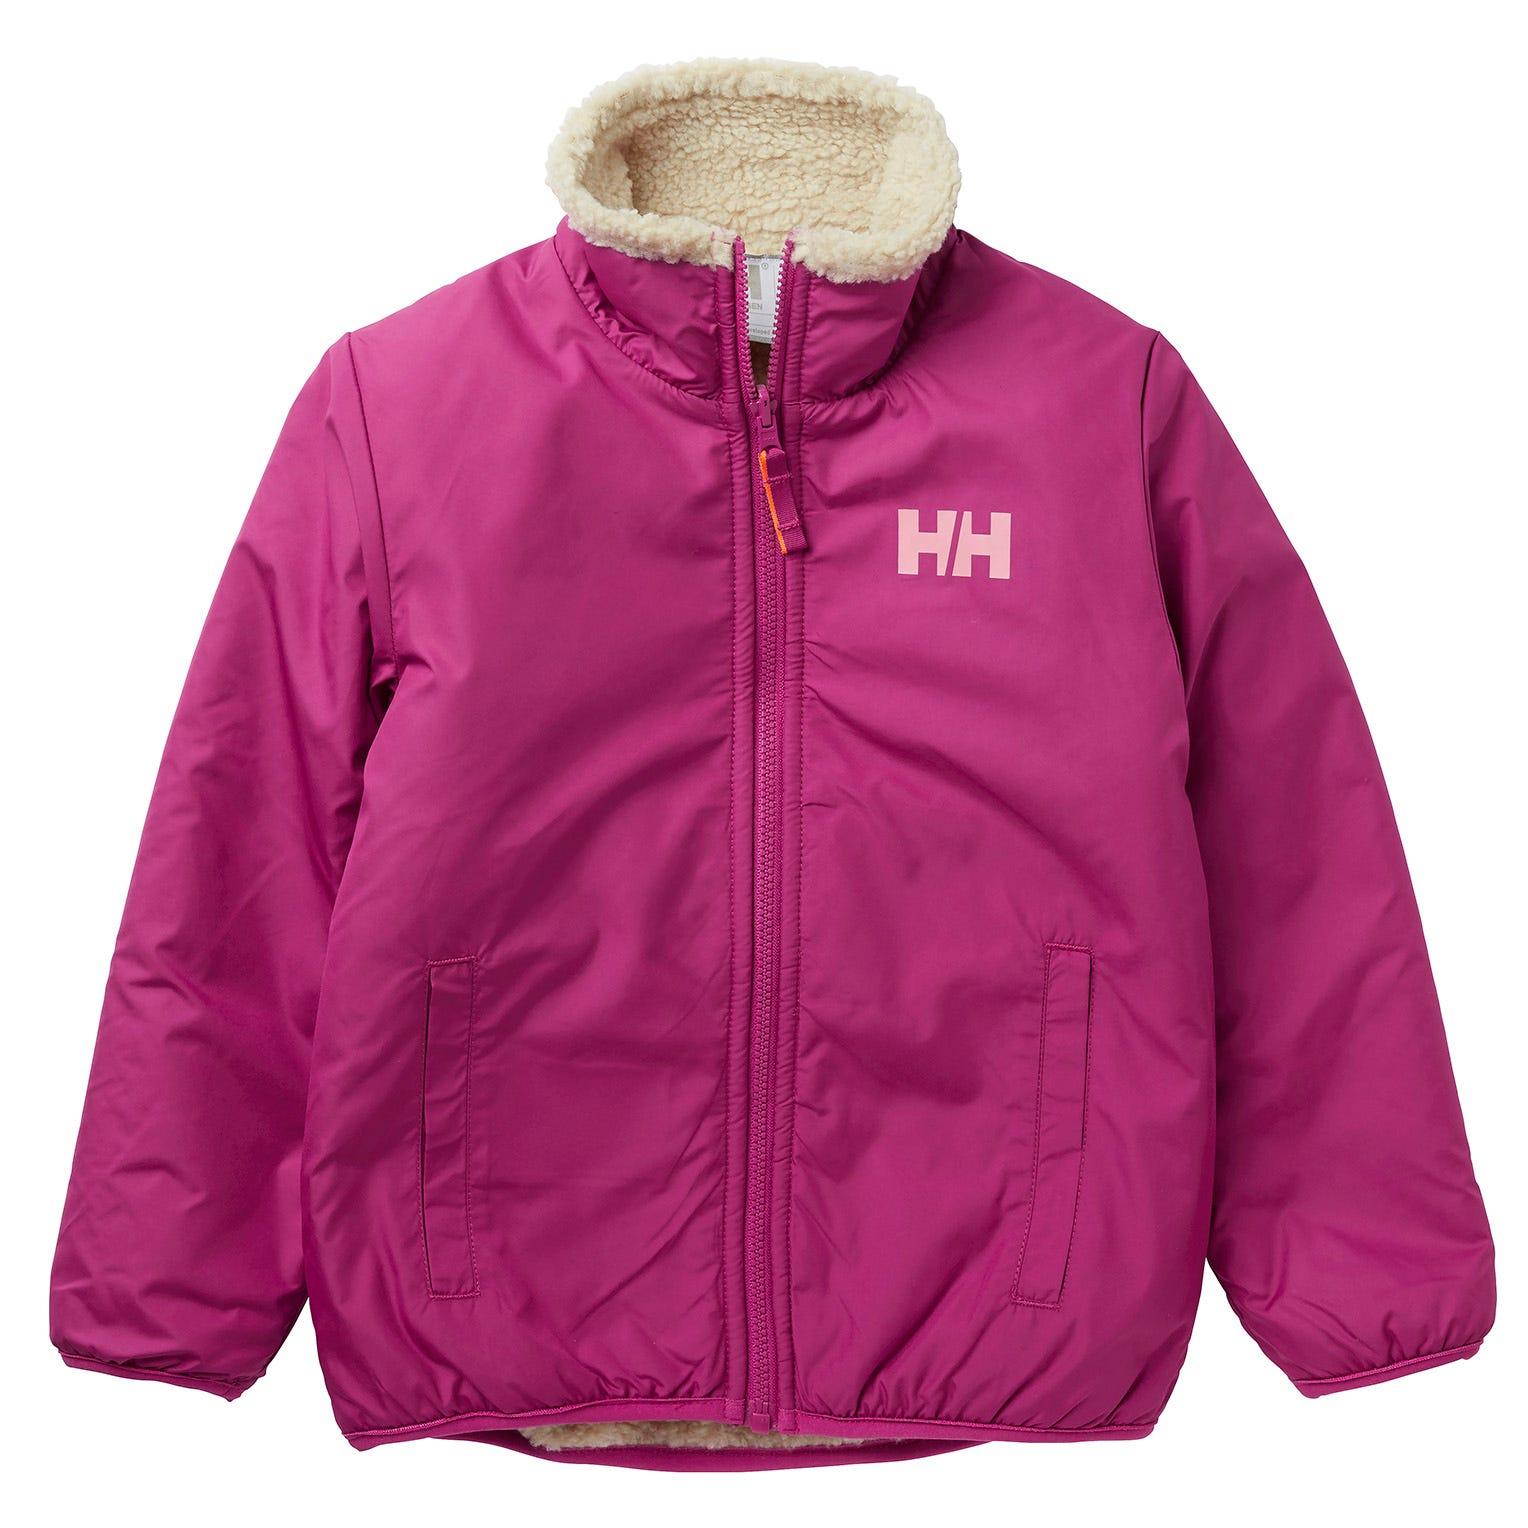 Helly Hansen Kids Reversible Pile Jacket Parka Yellow 116/6